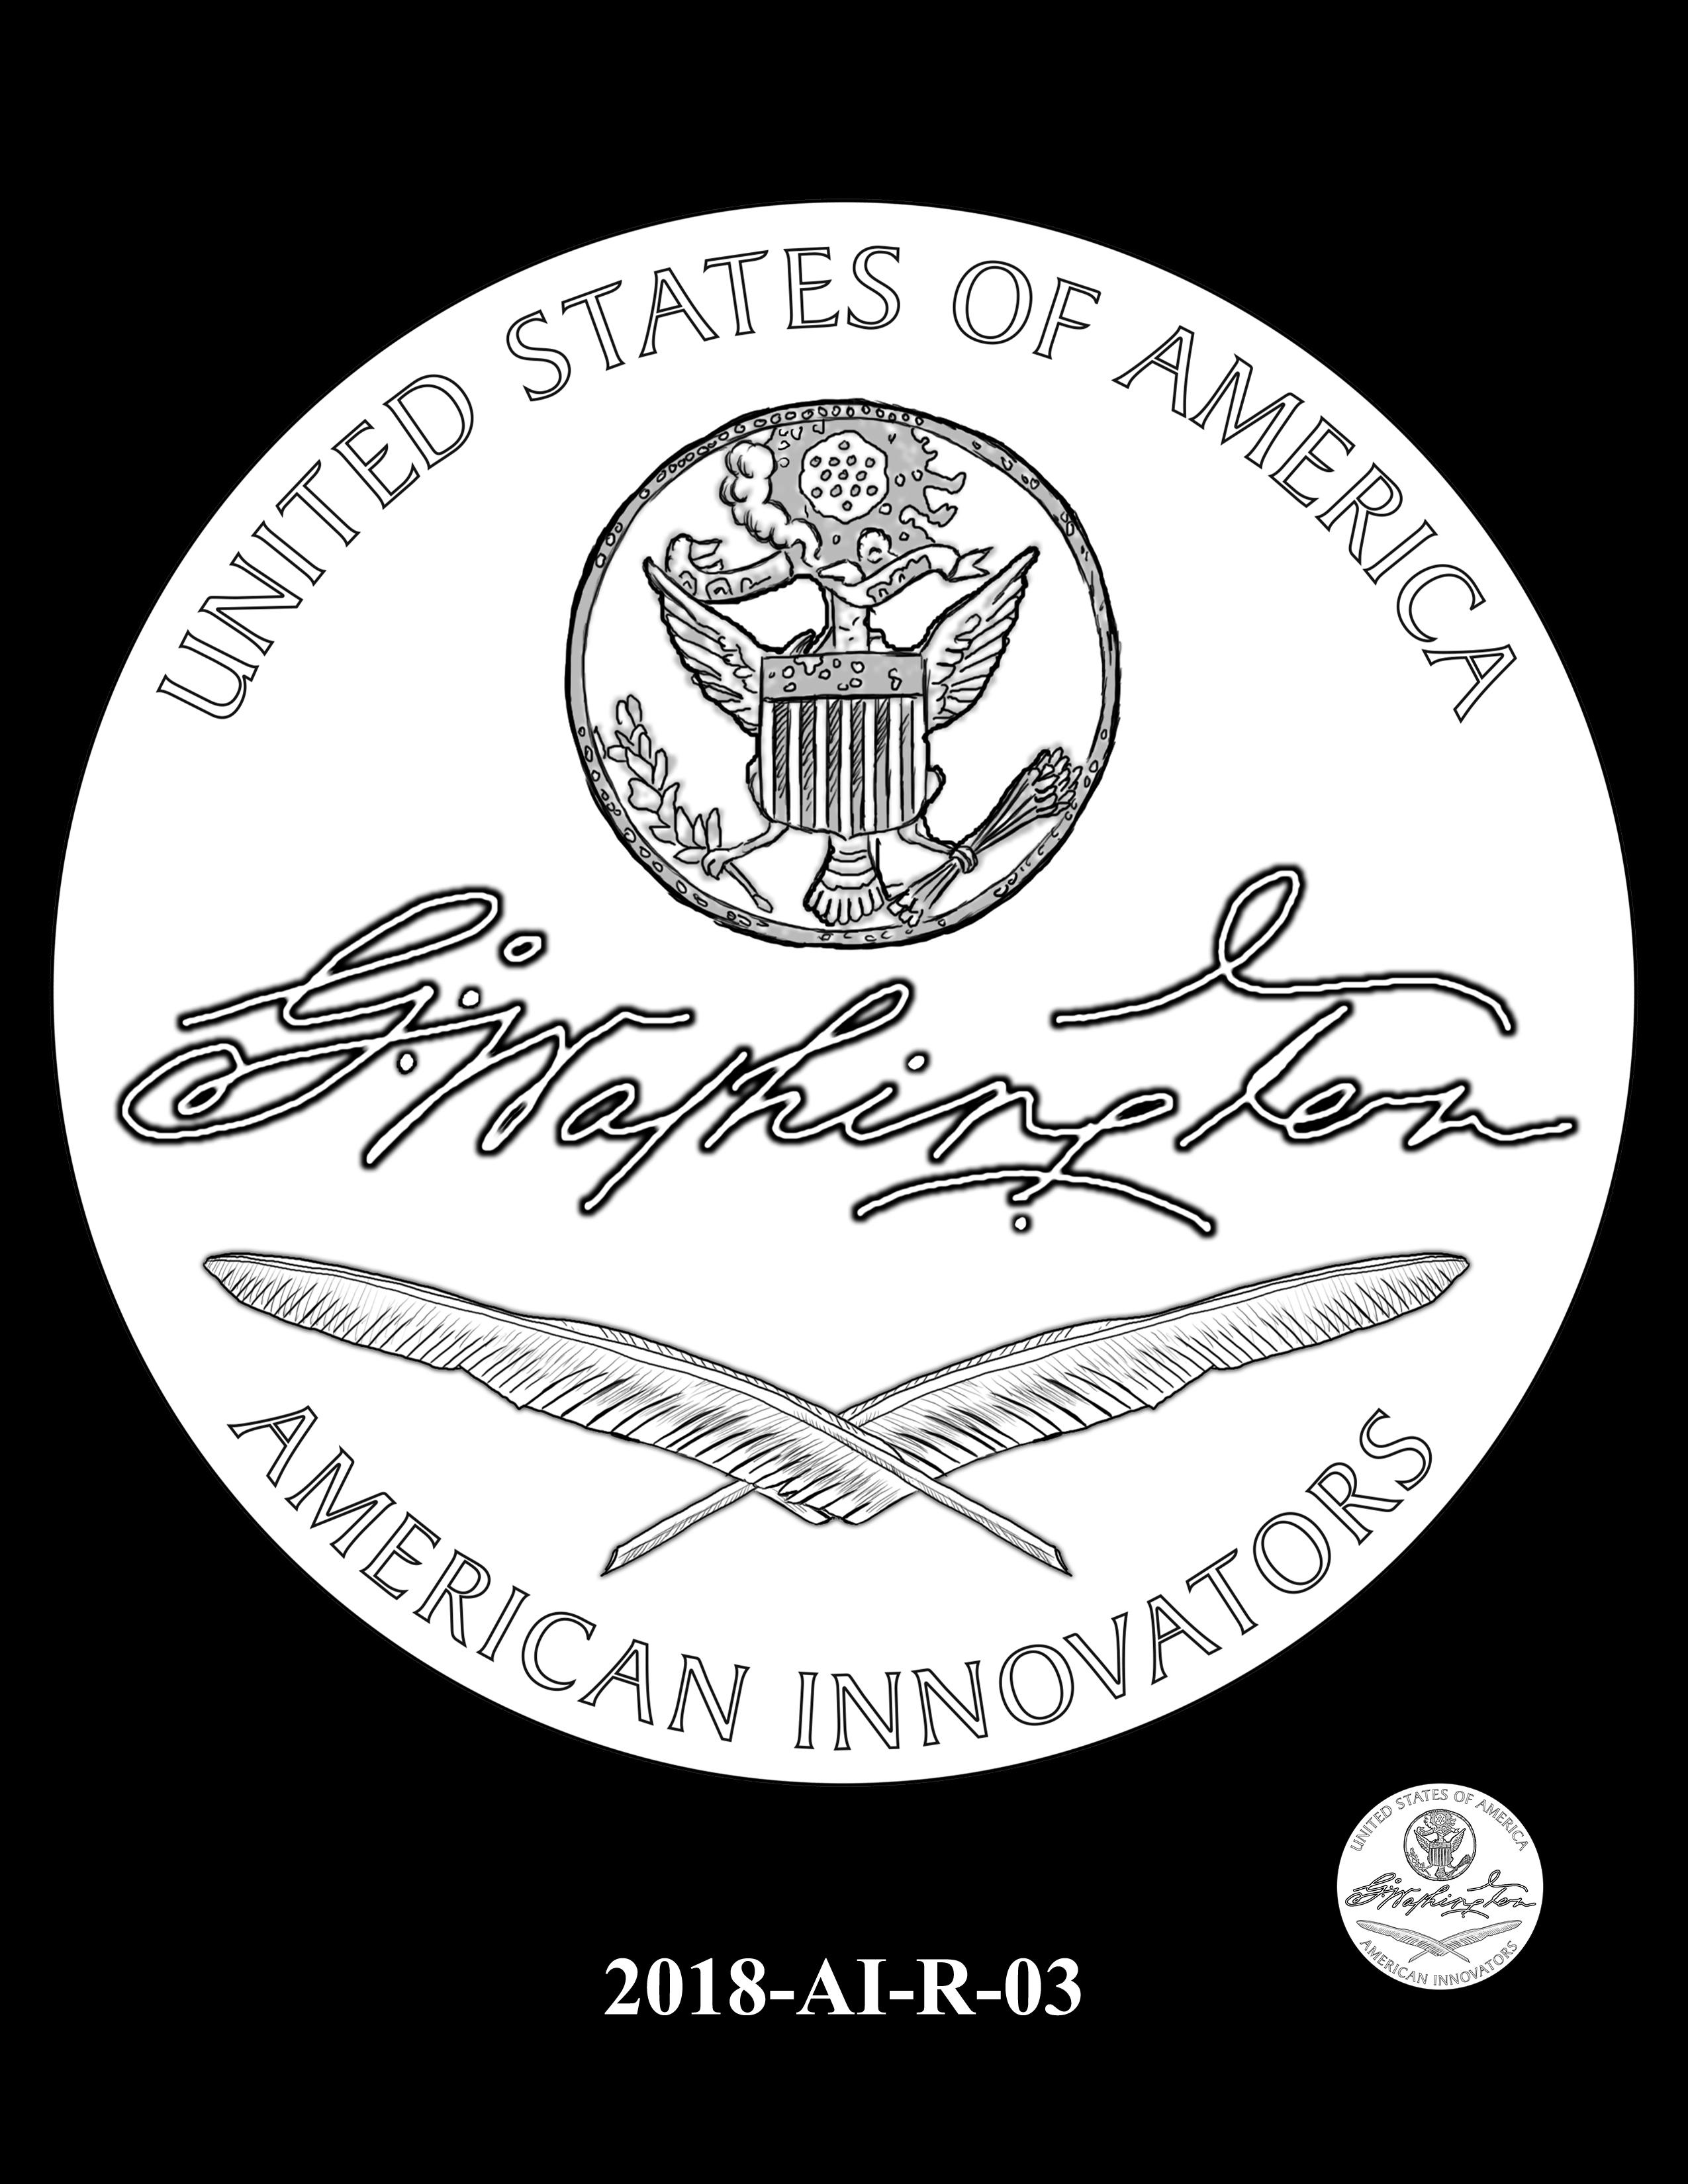 2018-AI-R-03 -- 2018 American Innovation $1 Coin